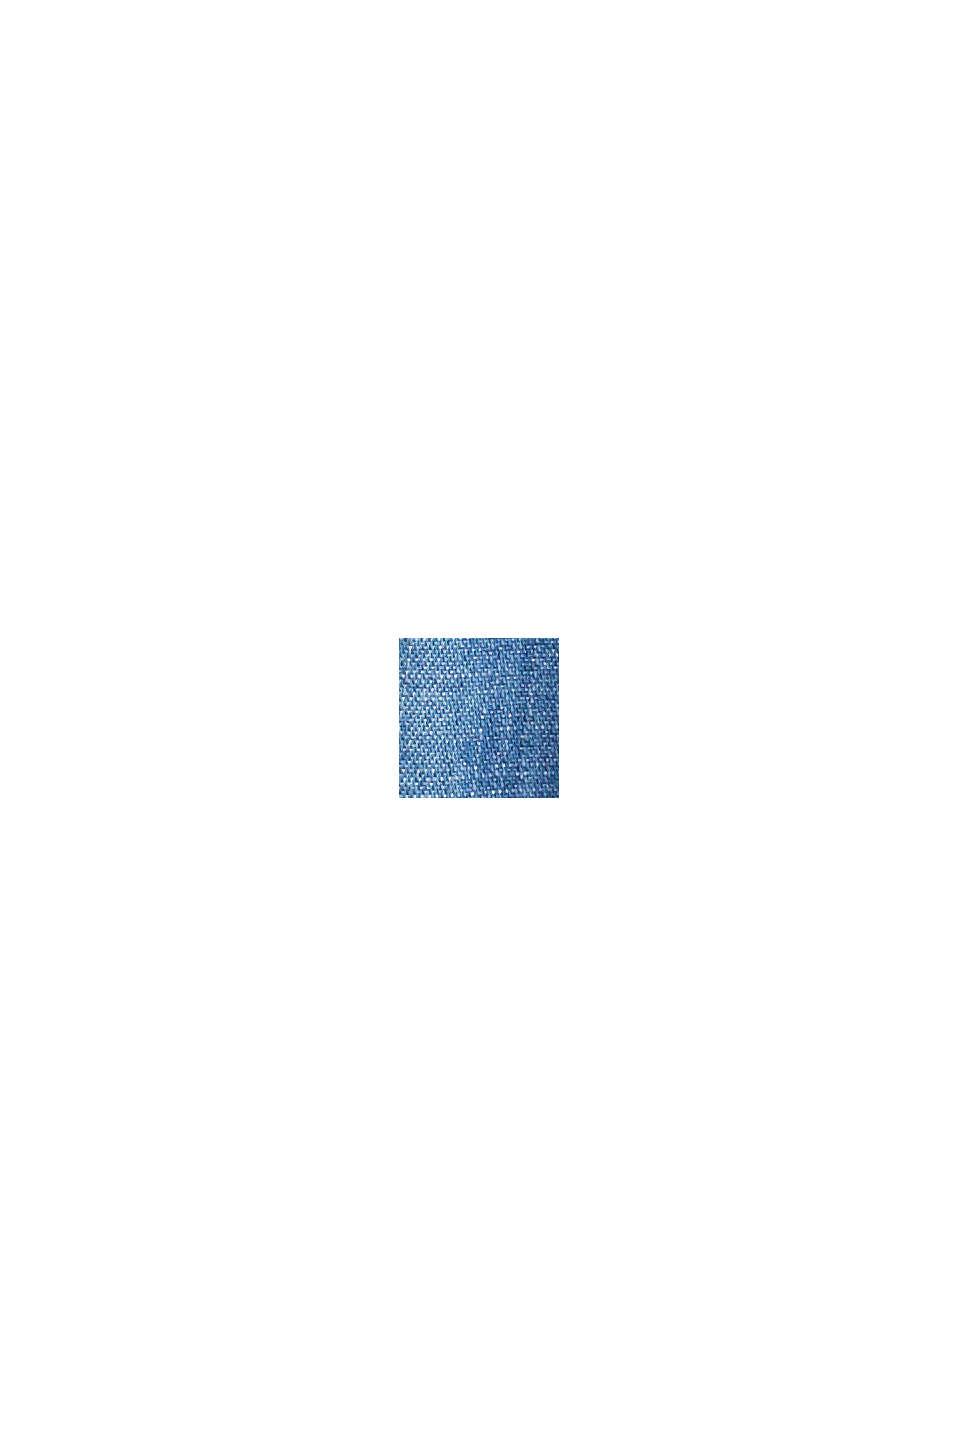 CURVY TENCEL™: abito di jeans con volant, BLUE MEDIUM WASHED, swatch